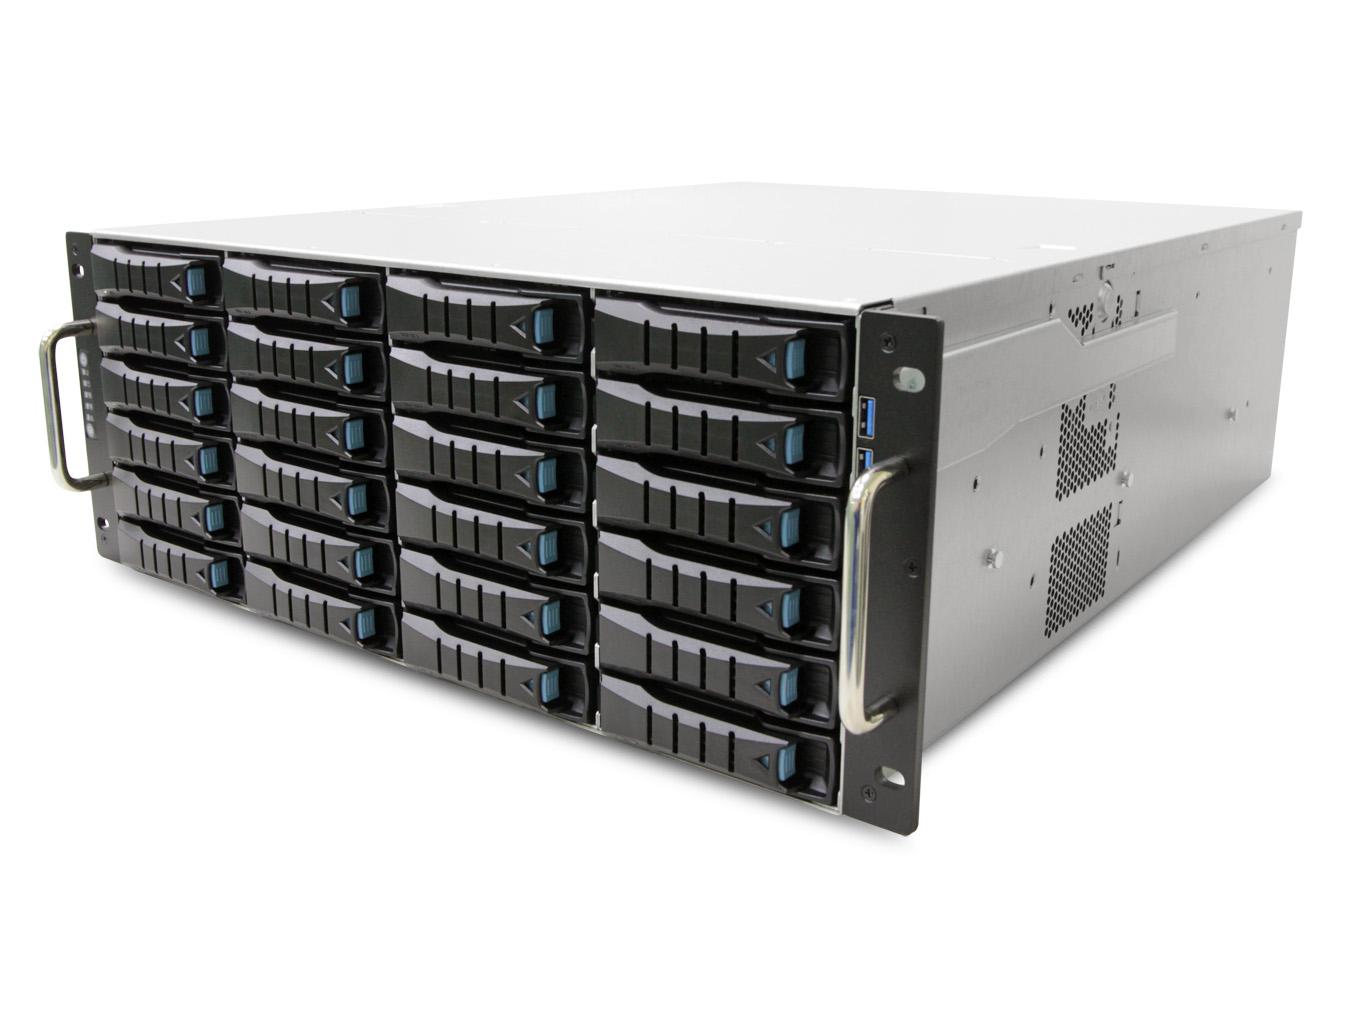 AIC RSC-4ETS XE1-4ETS0-02 4U 24-bay Storage Server Chassis